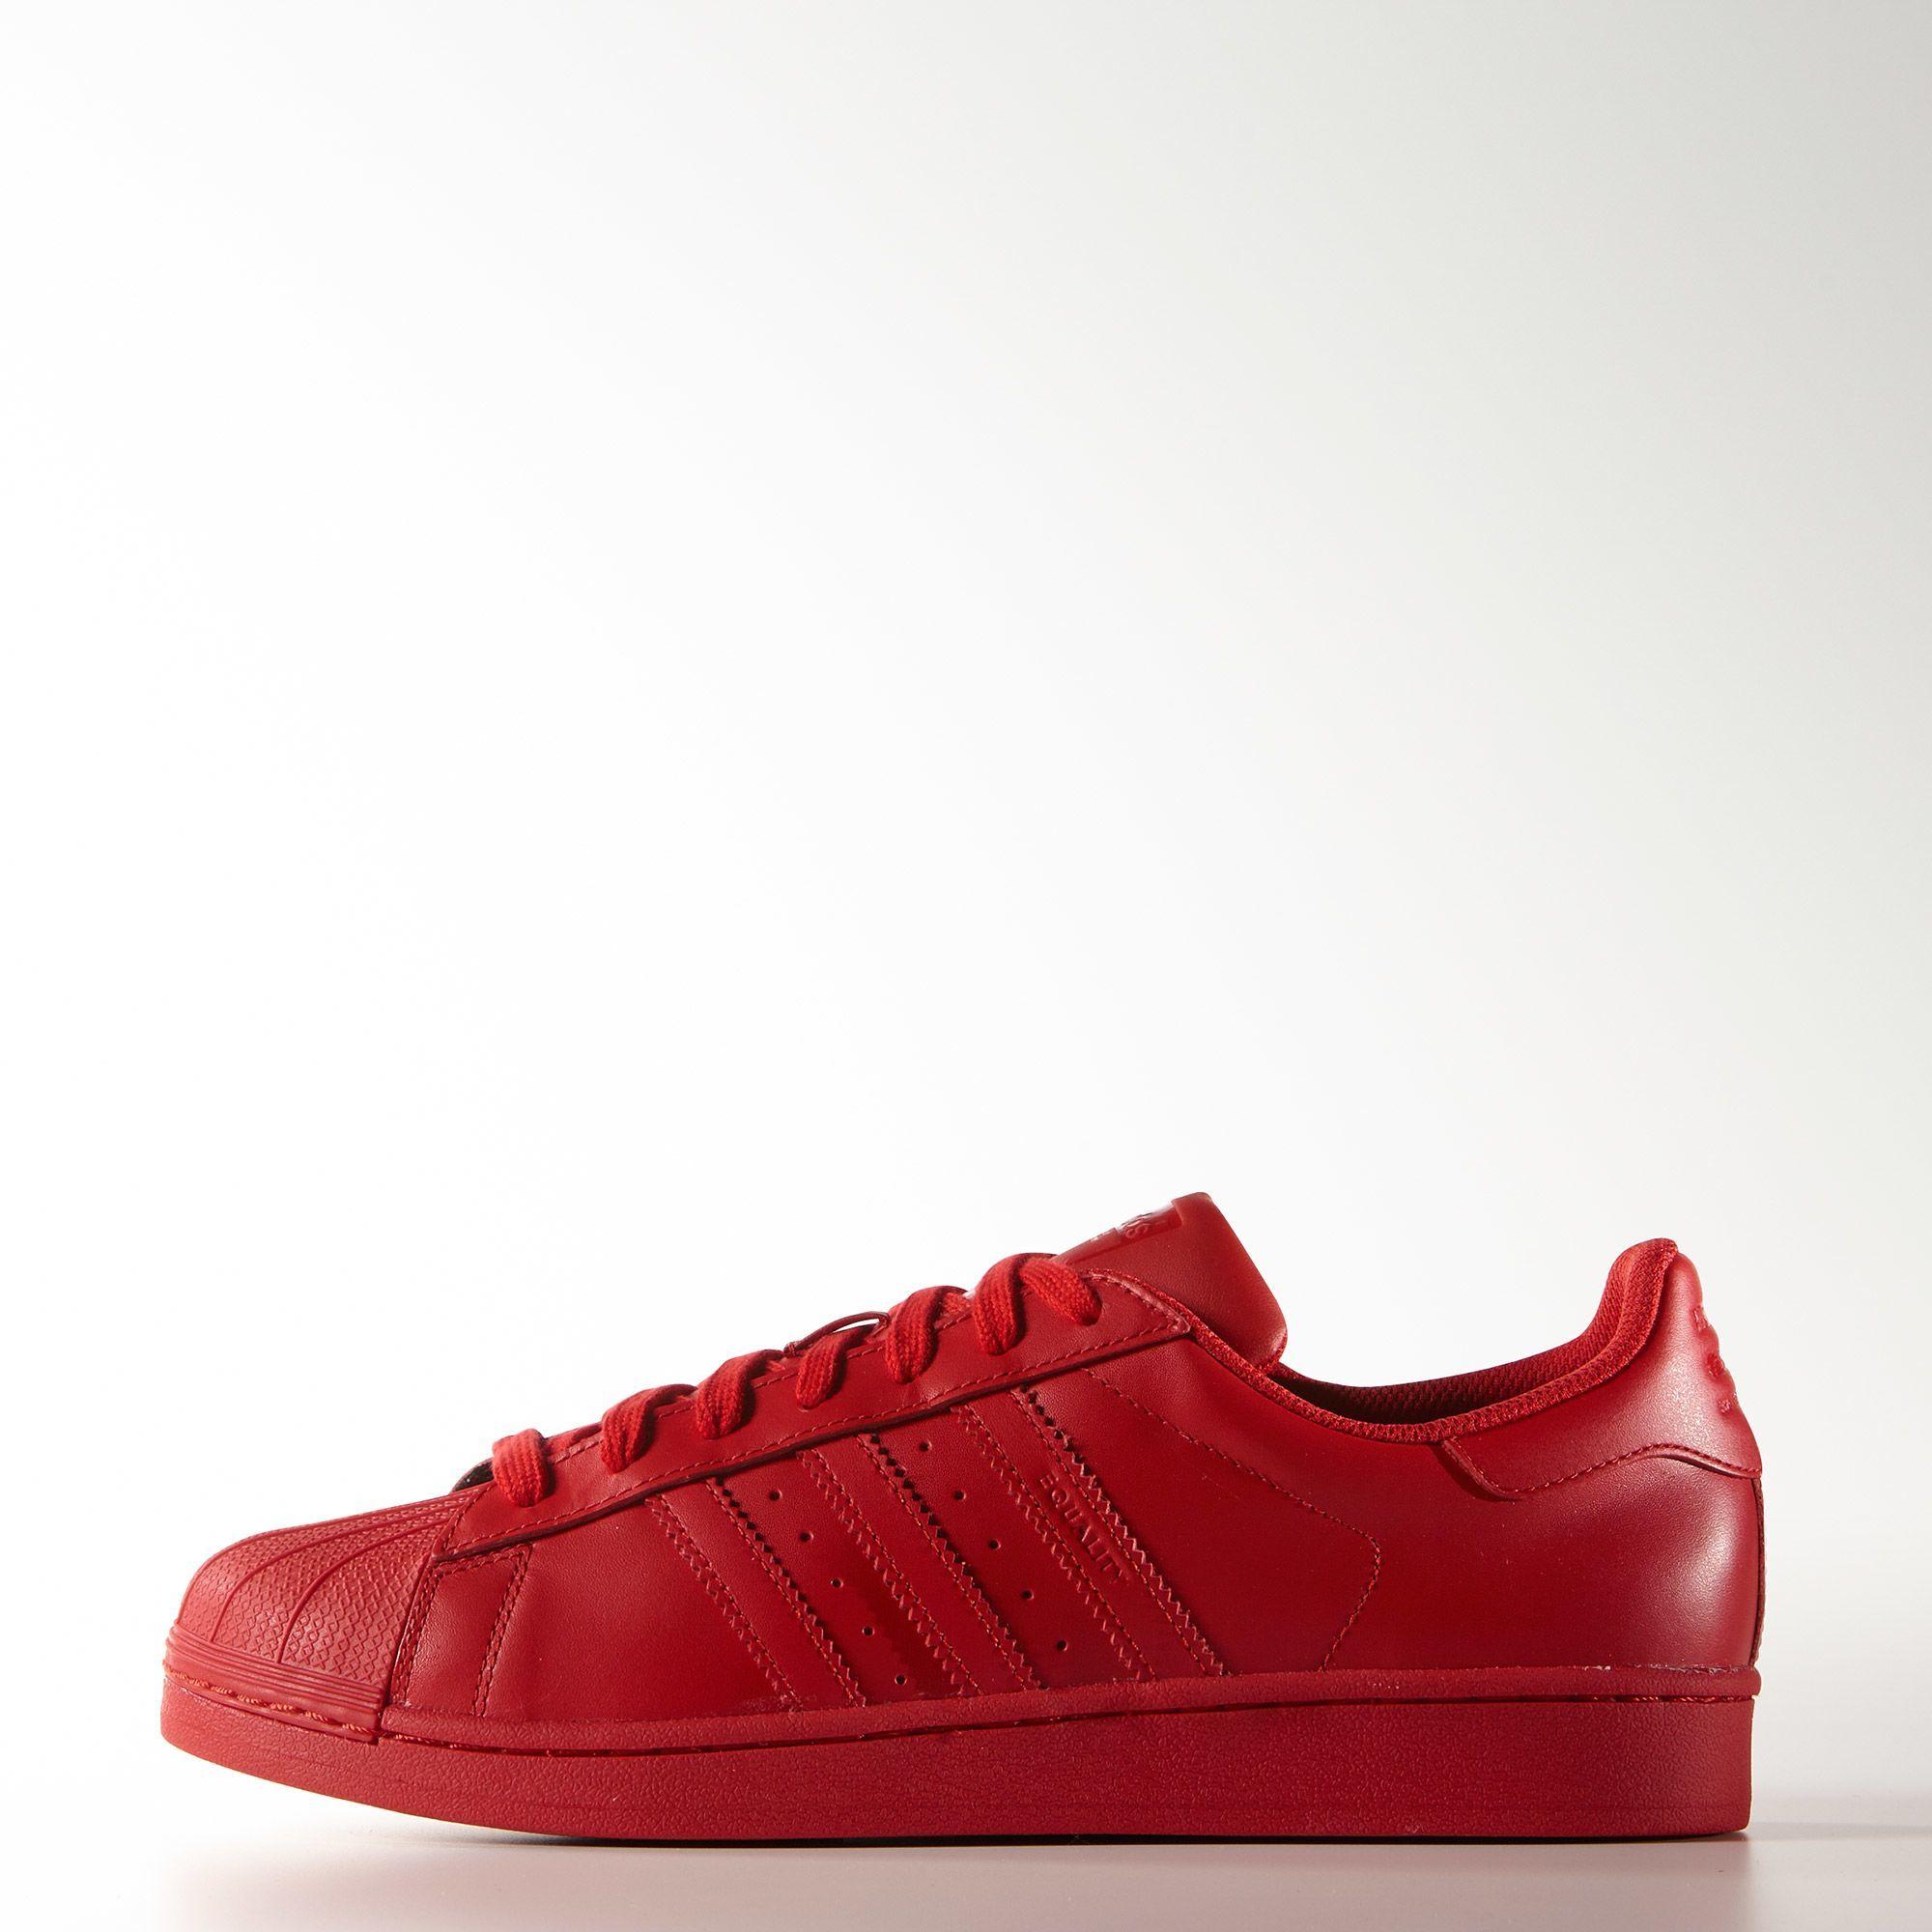 quality design 82567 0170f adidas - Tenis Superstar Supercolor Pharrell Williams